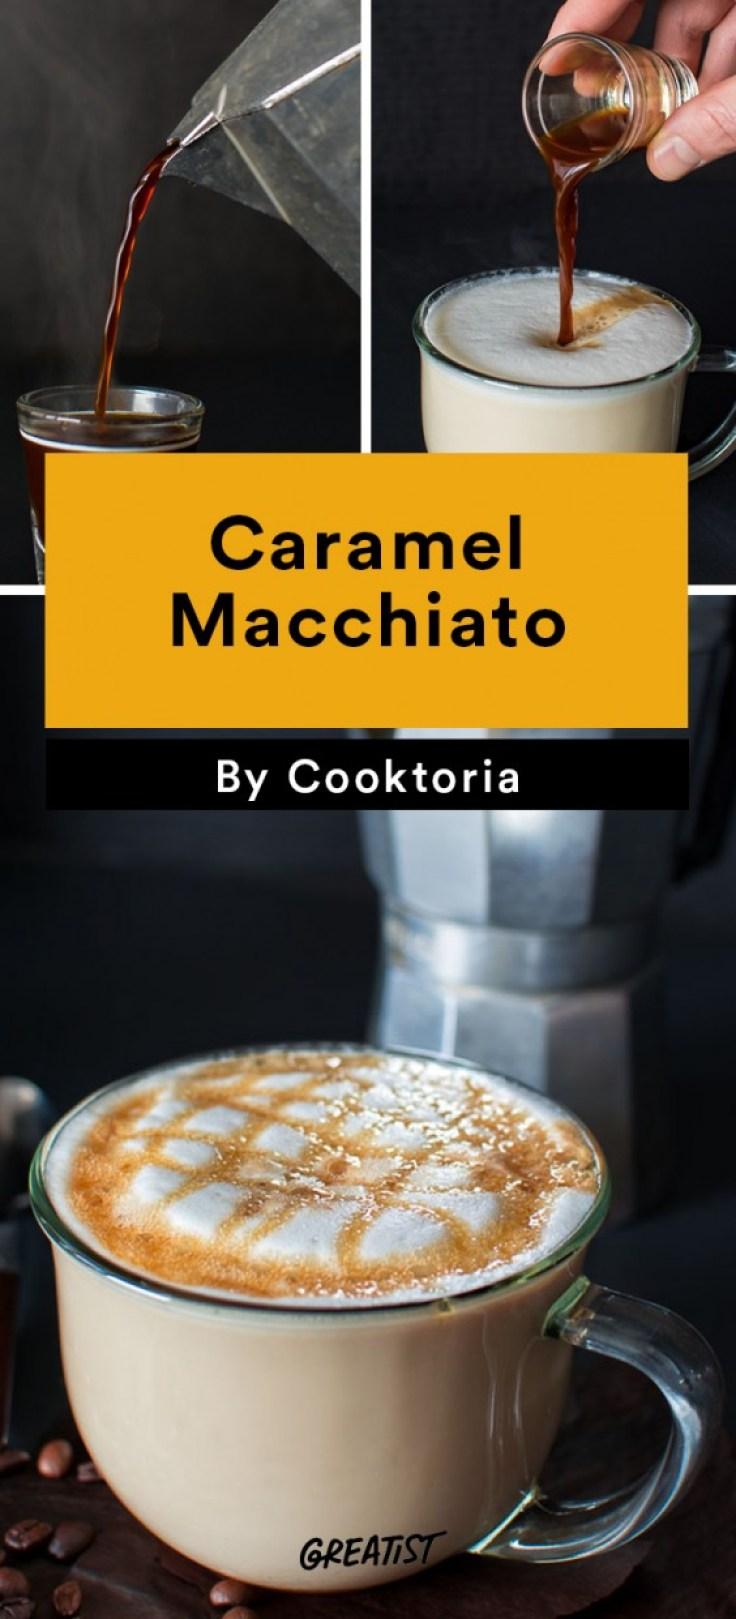 At Home Starbucks Recipes: Caramel Macchiato